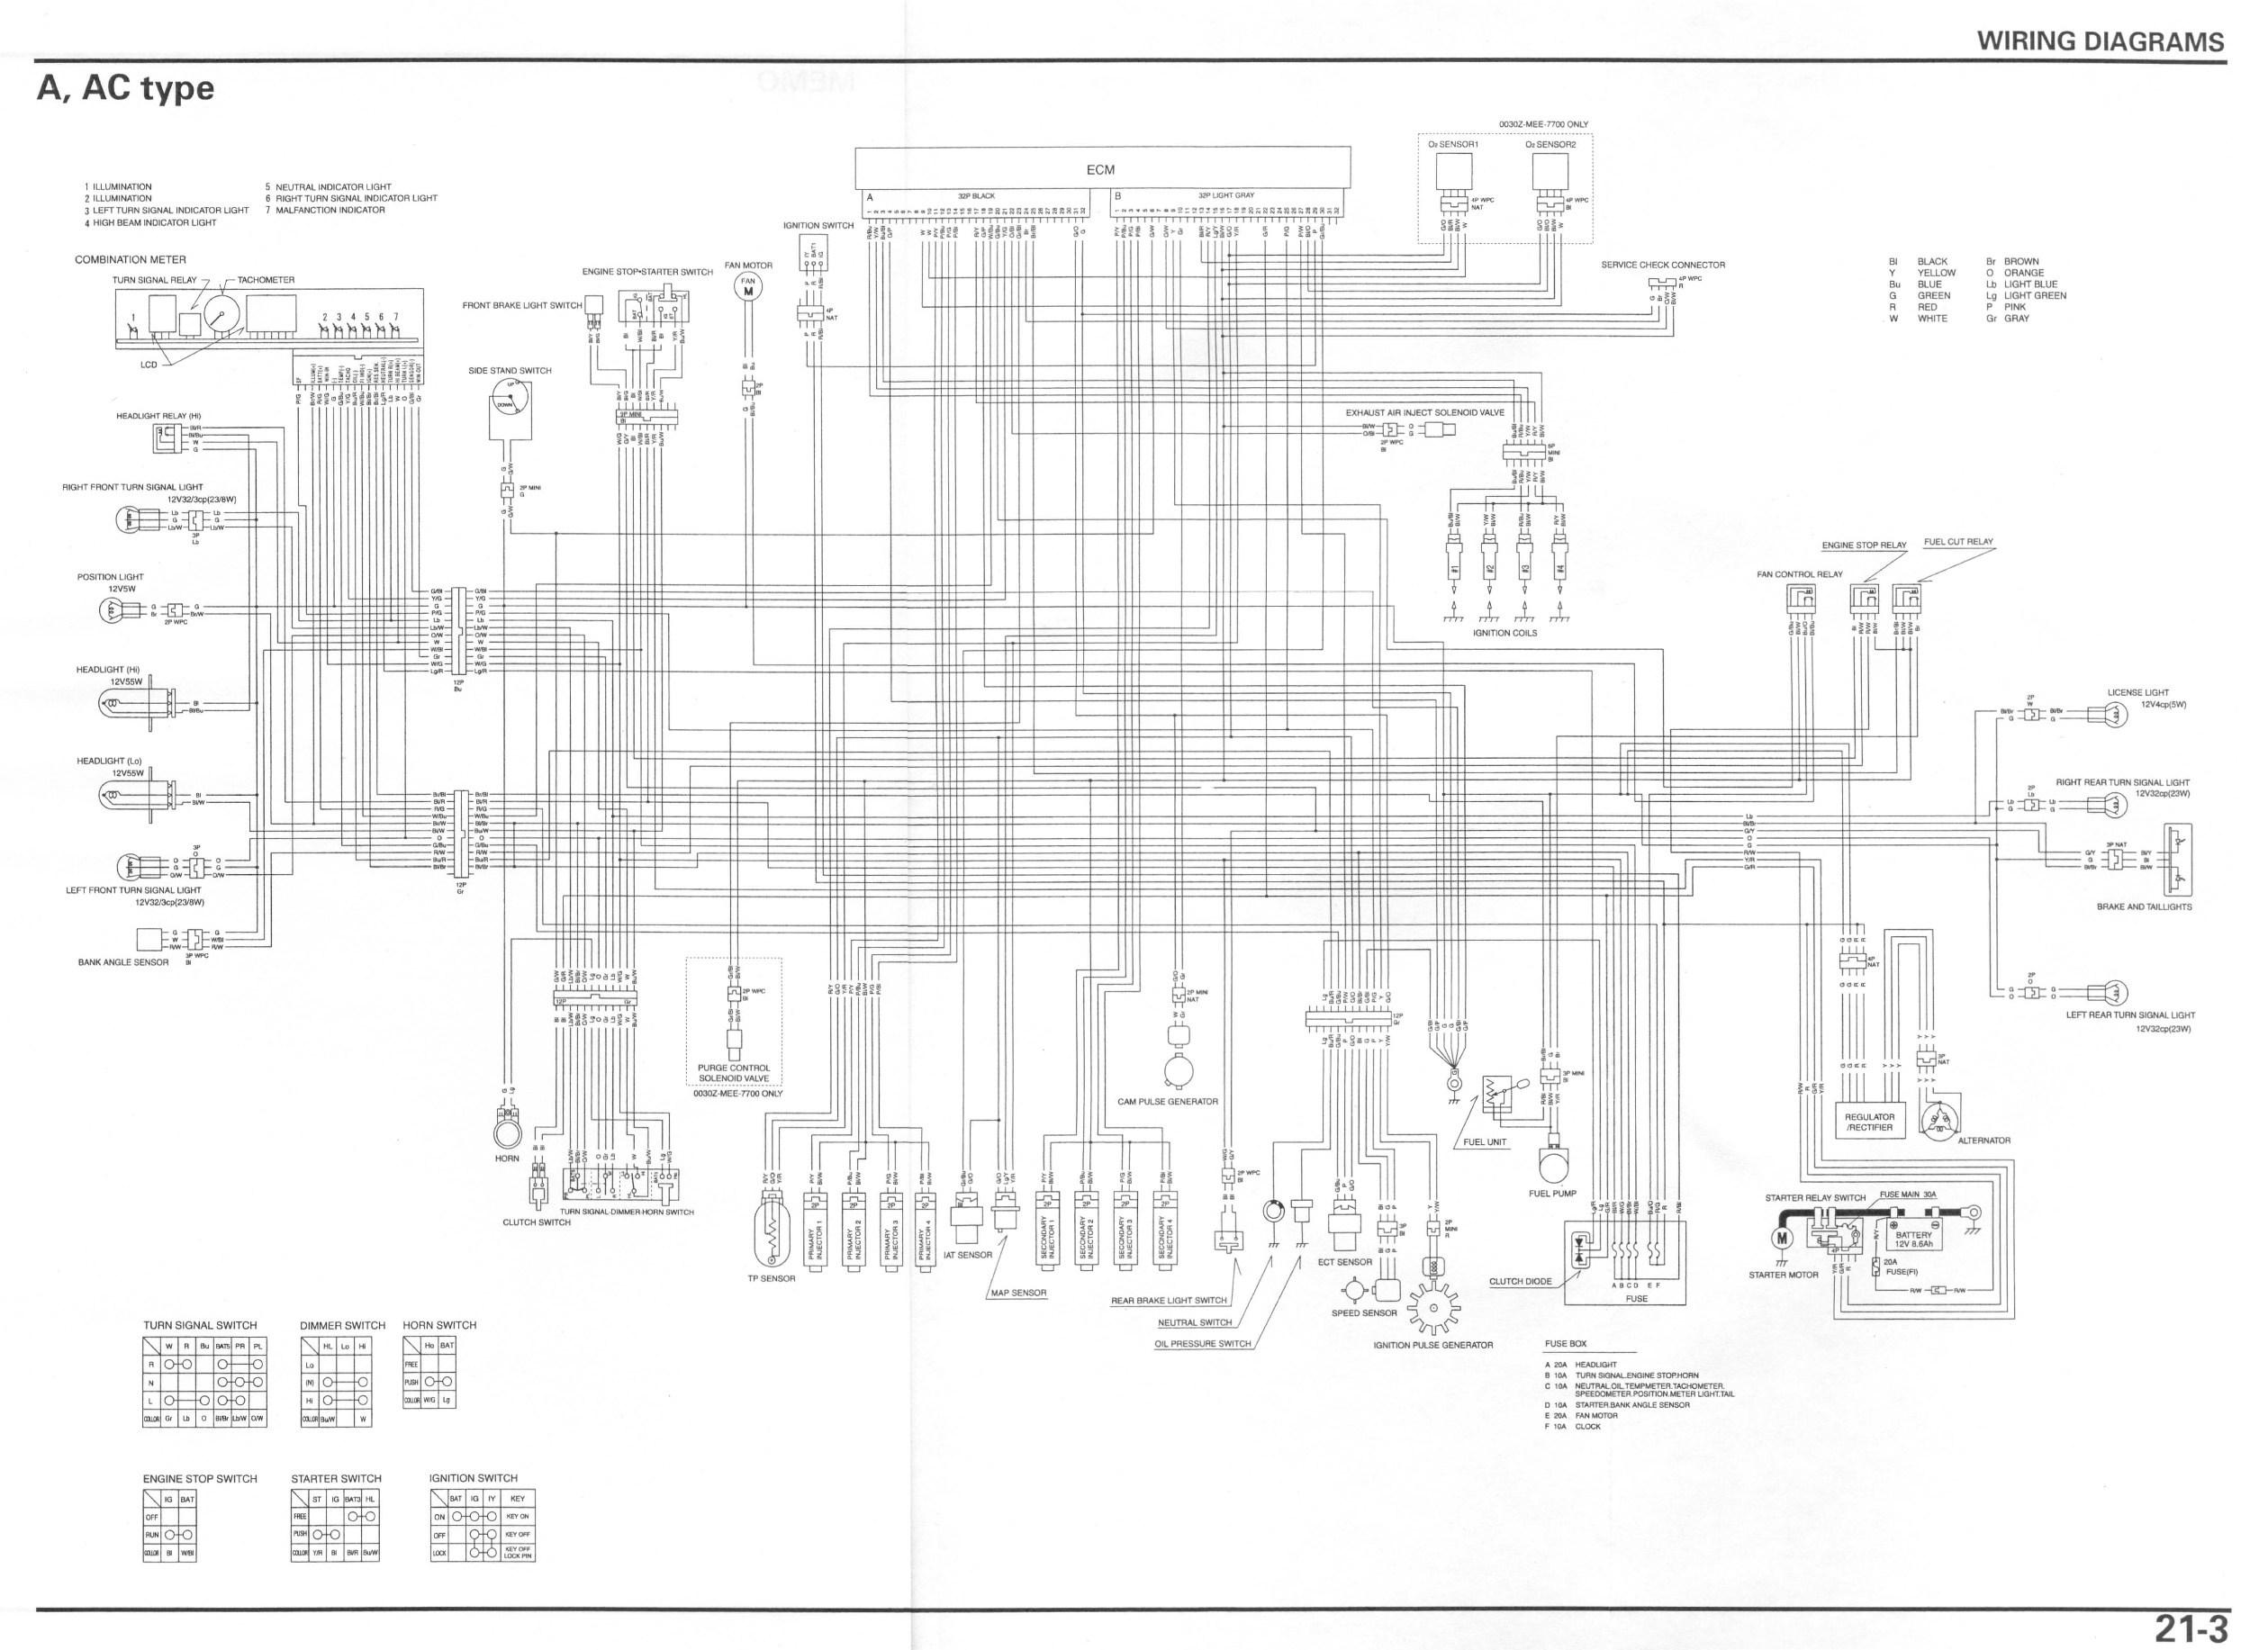 Tm 0272 Wiring Diagram 2003 Honda Cbr 600 Wiring Free Engine Image For User Free Diagram